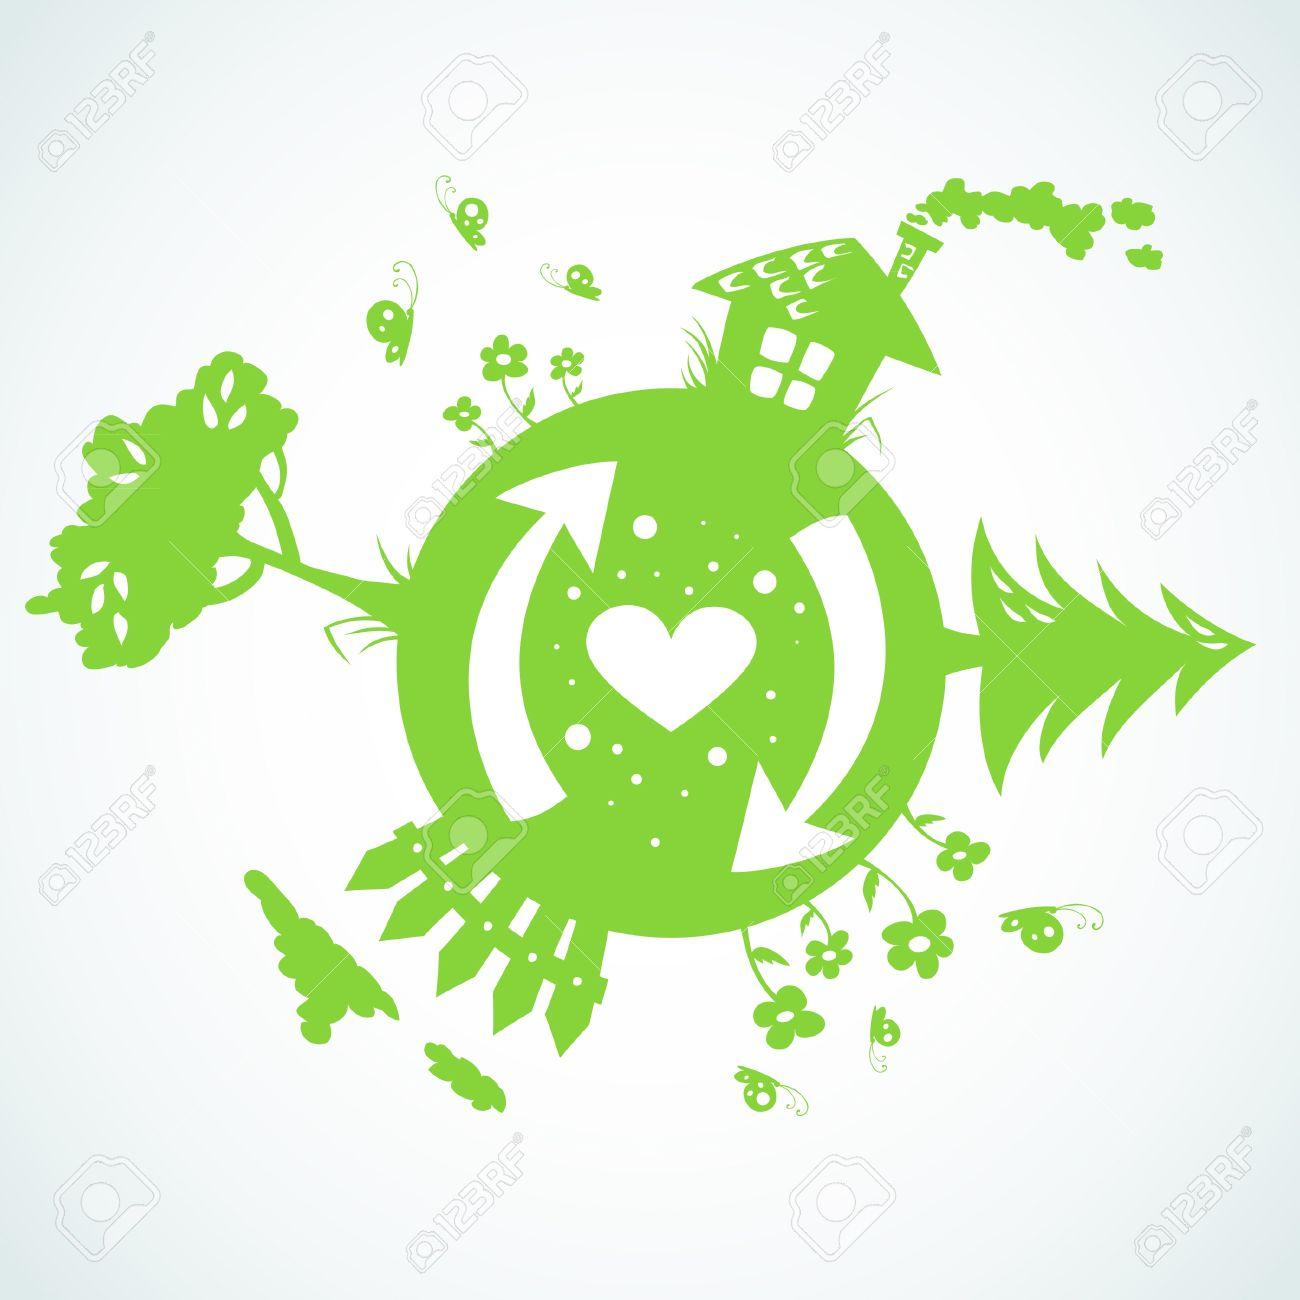 Earth day planet eco symbol royalty free cliparts vectors and earth day planet eco symbol stock vector 11658217 buycottarizona